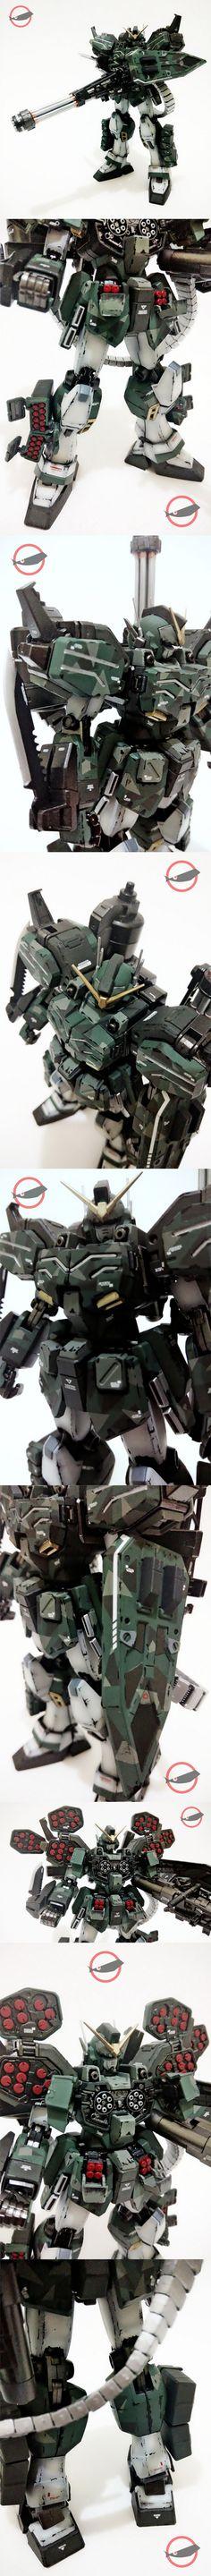 Gundam Heavyarms Guerilla Warfare Detail Looks 2